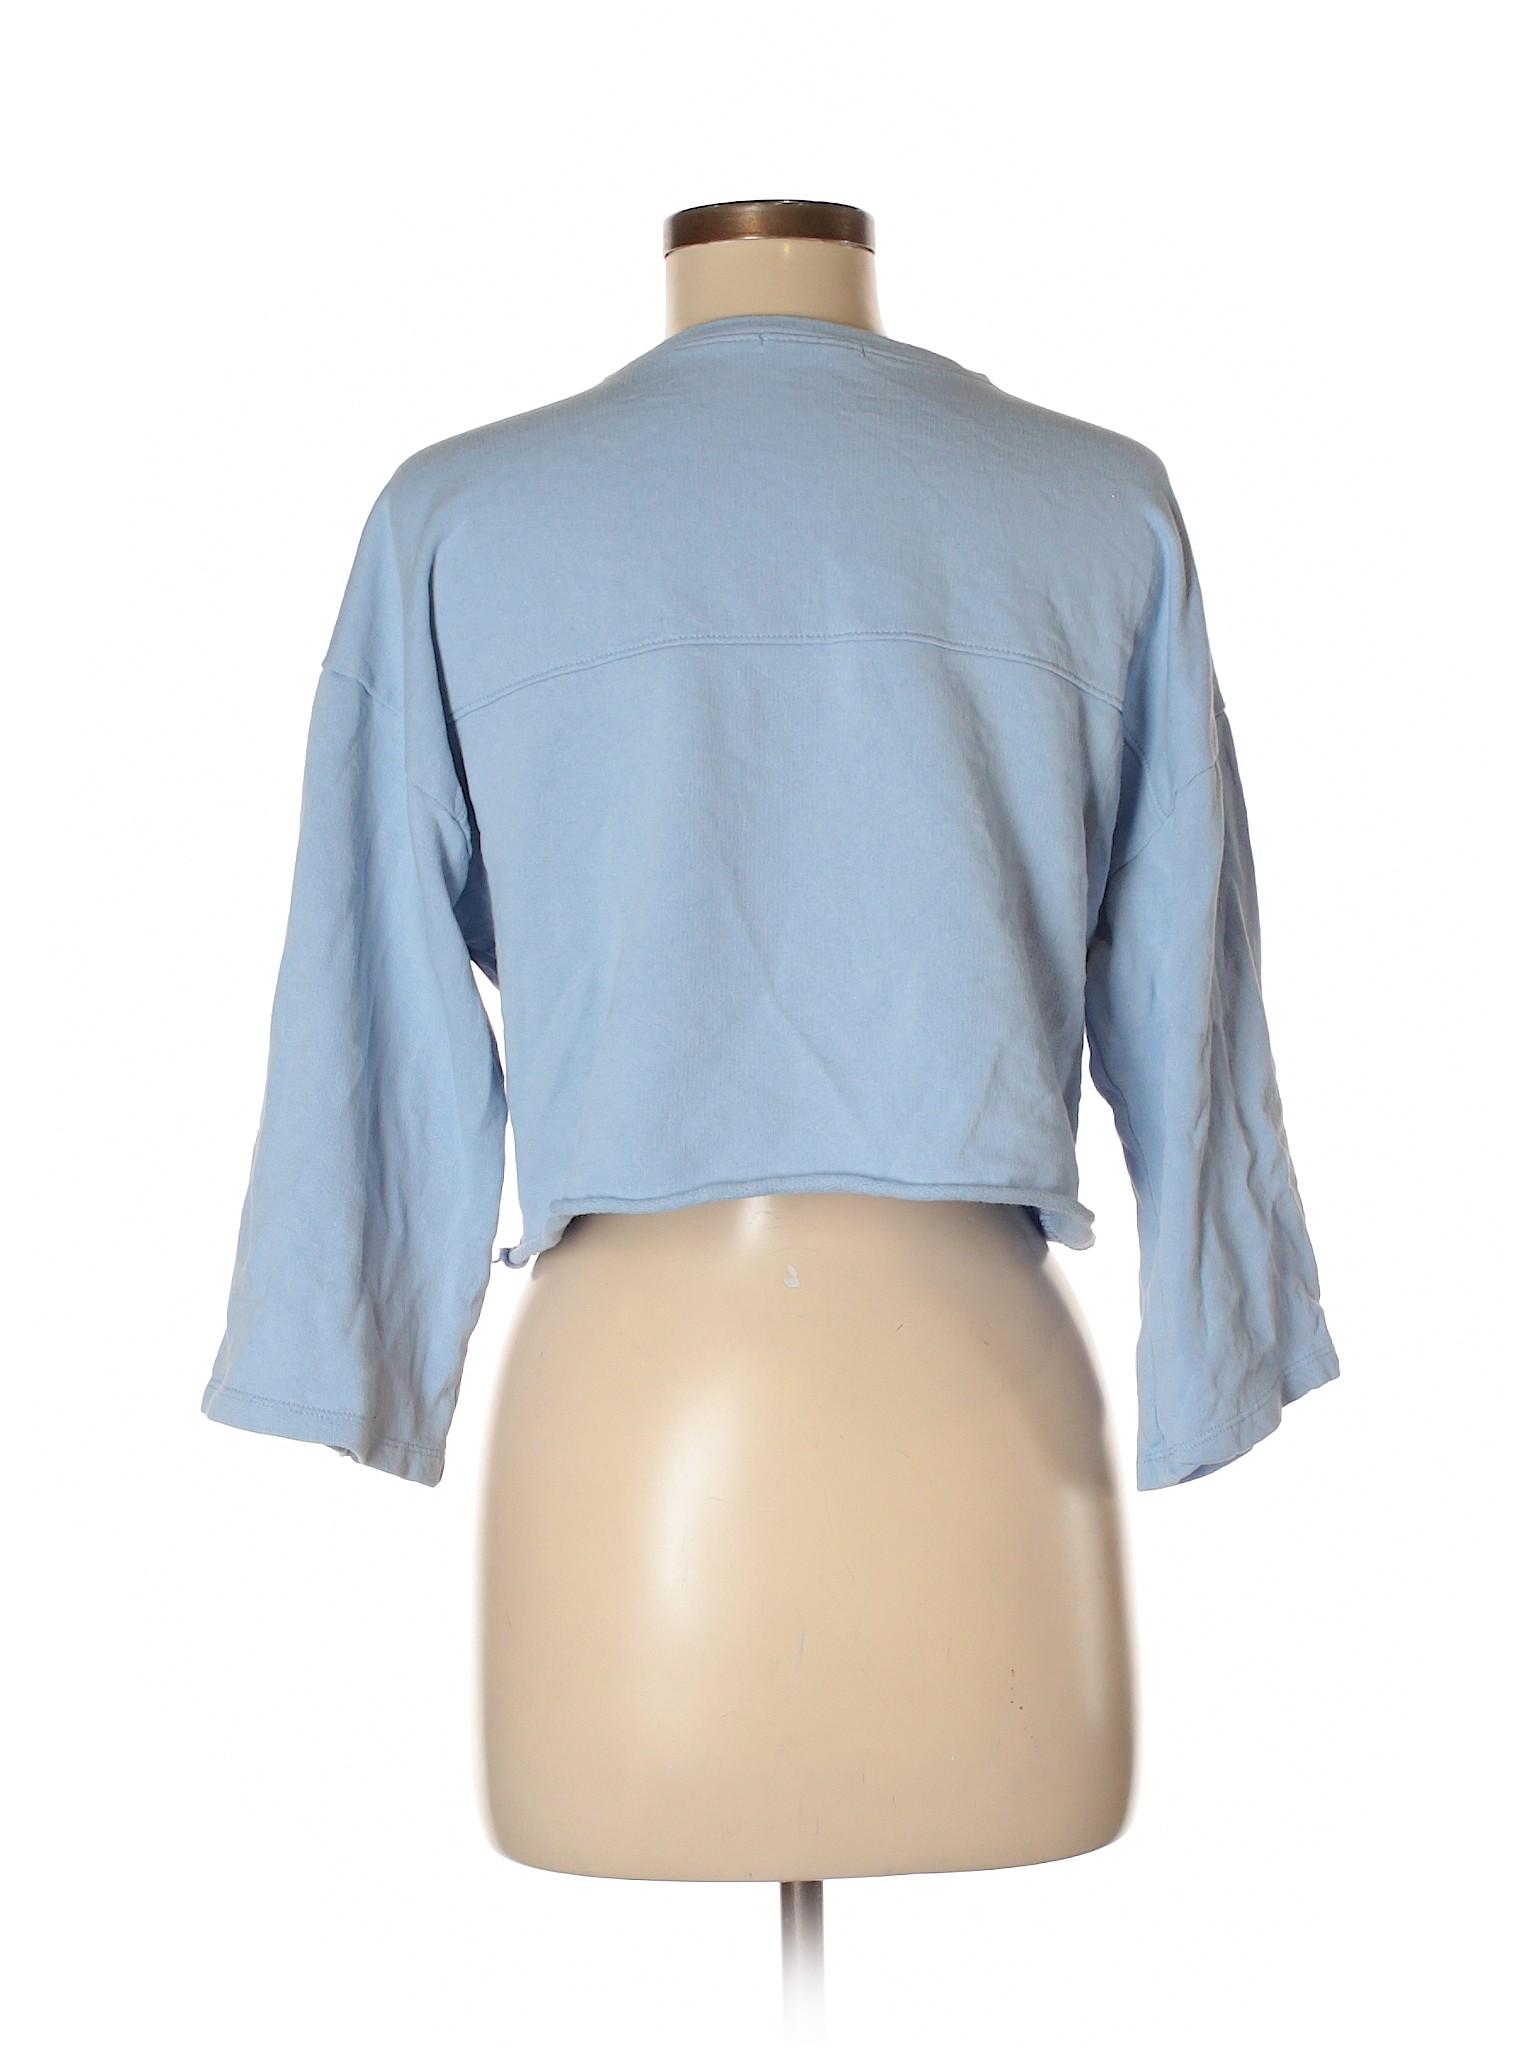 Zara Sweater Boutique Boutique Pullover winter winter XnStRxqq